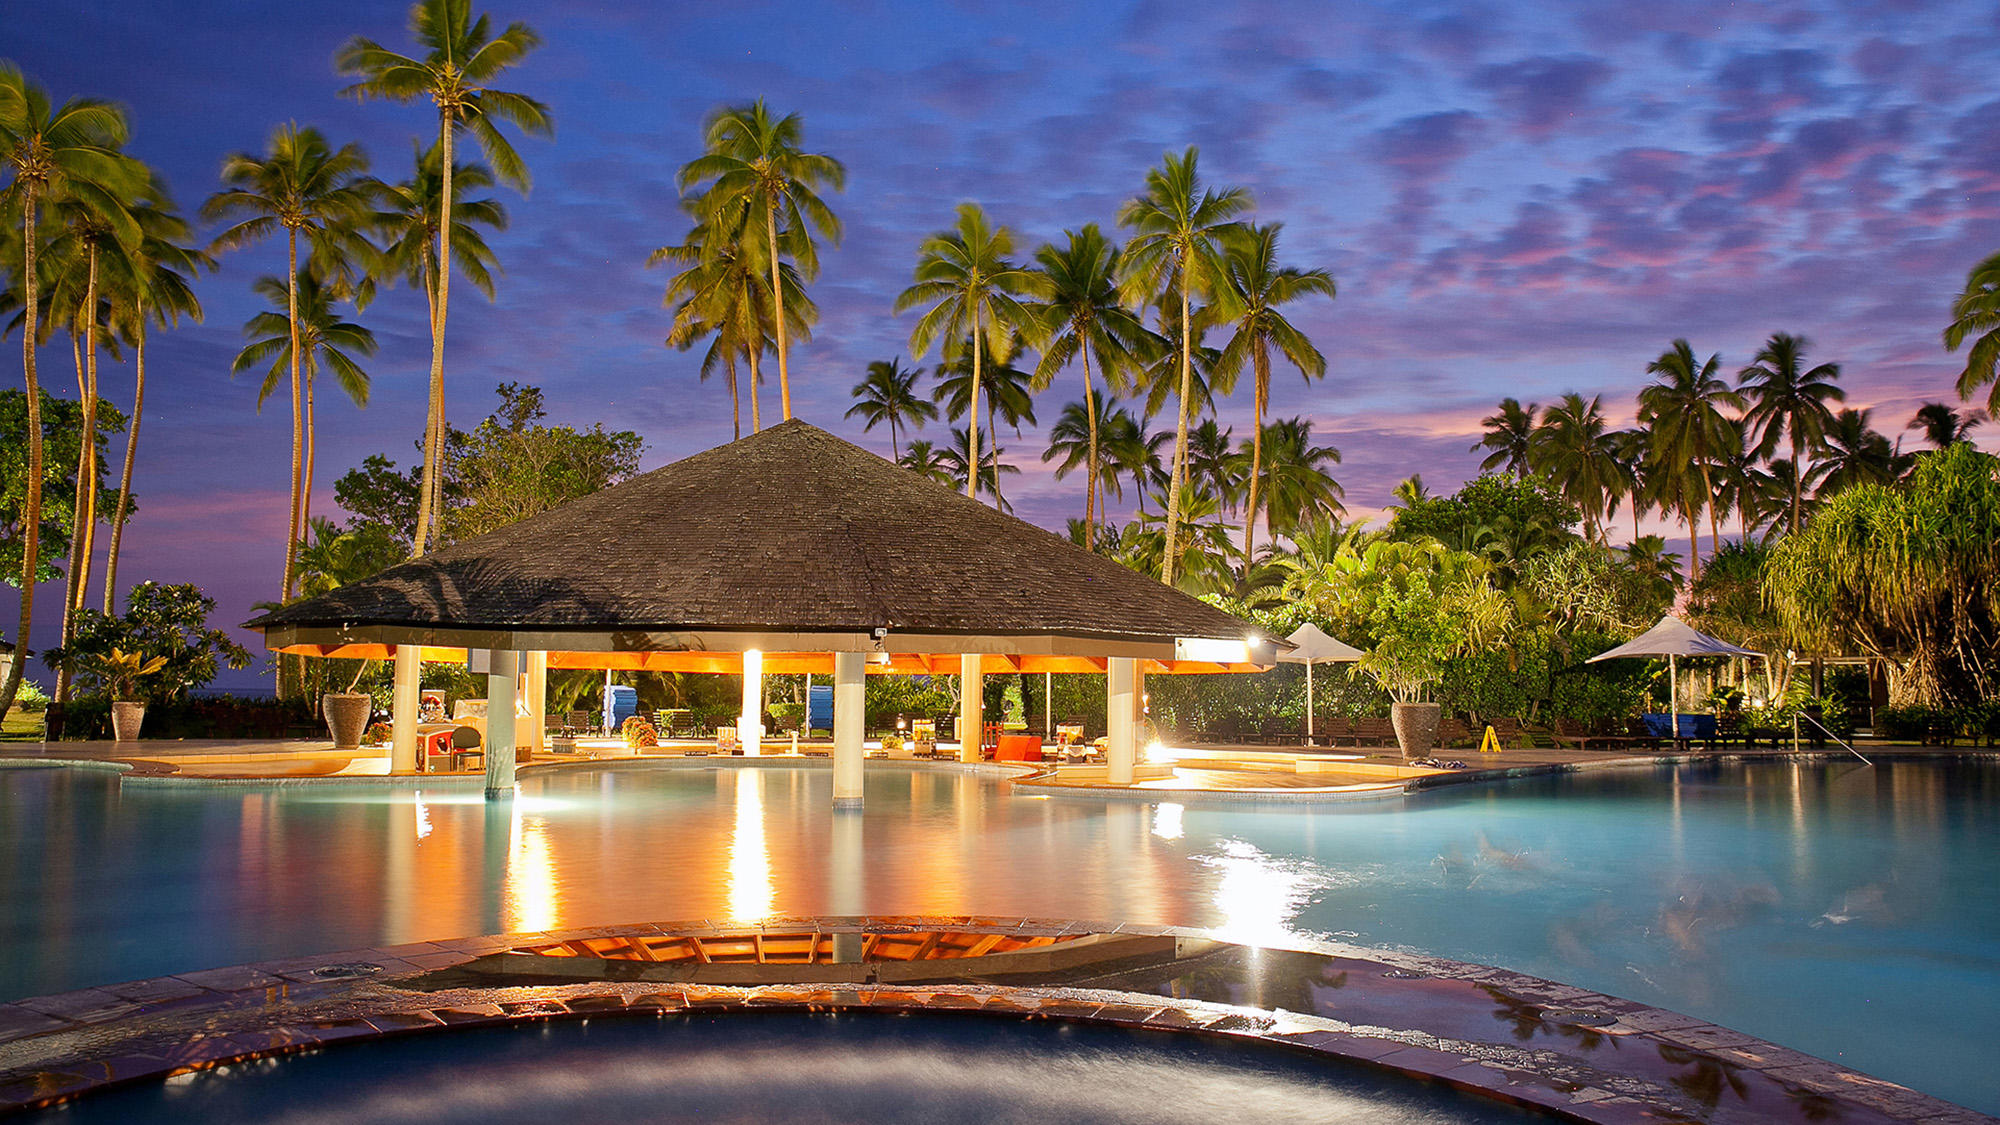 Pool Bar at Sunset at Naviti Resort Fiji